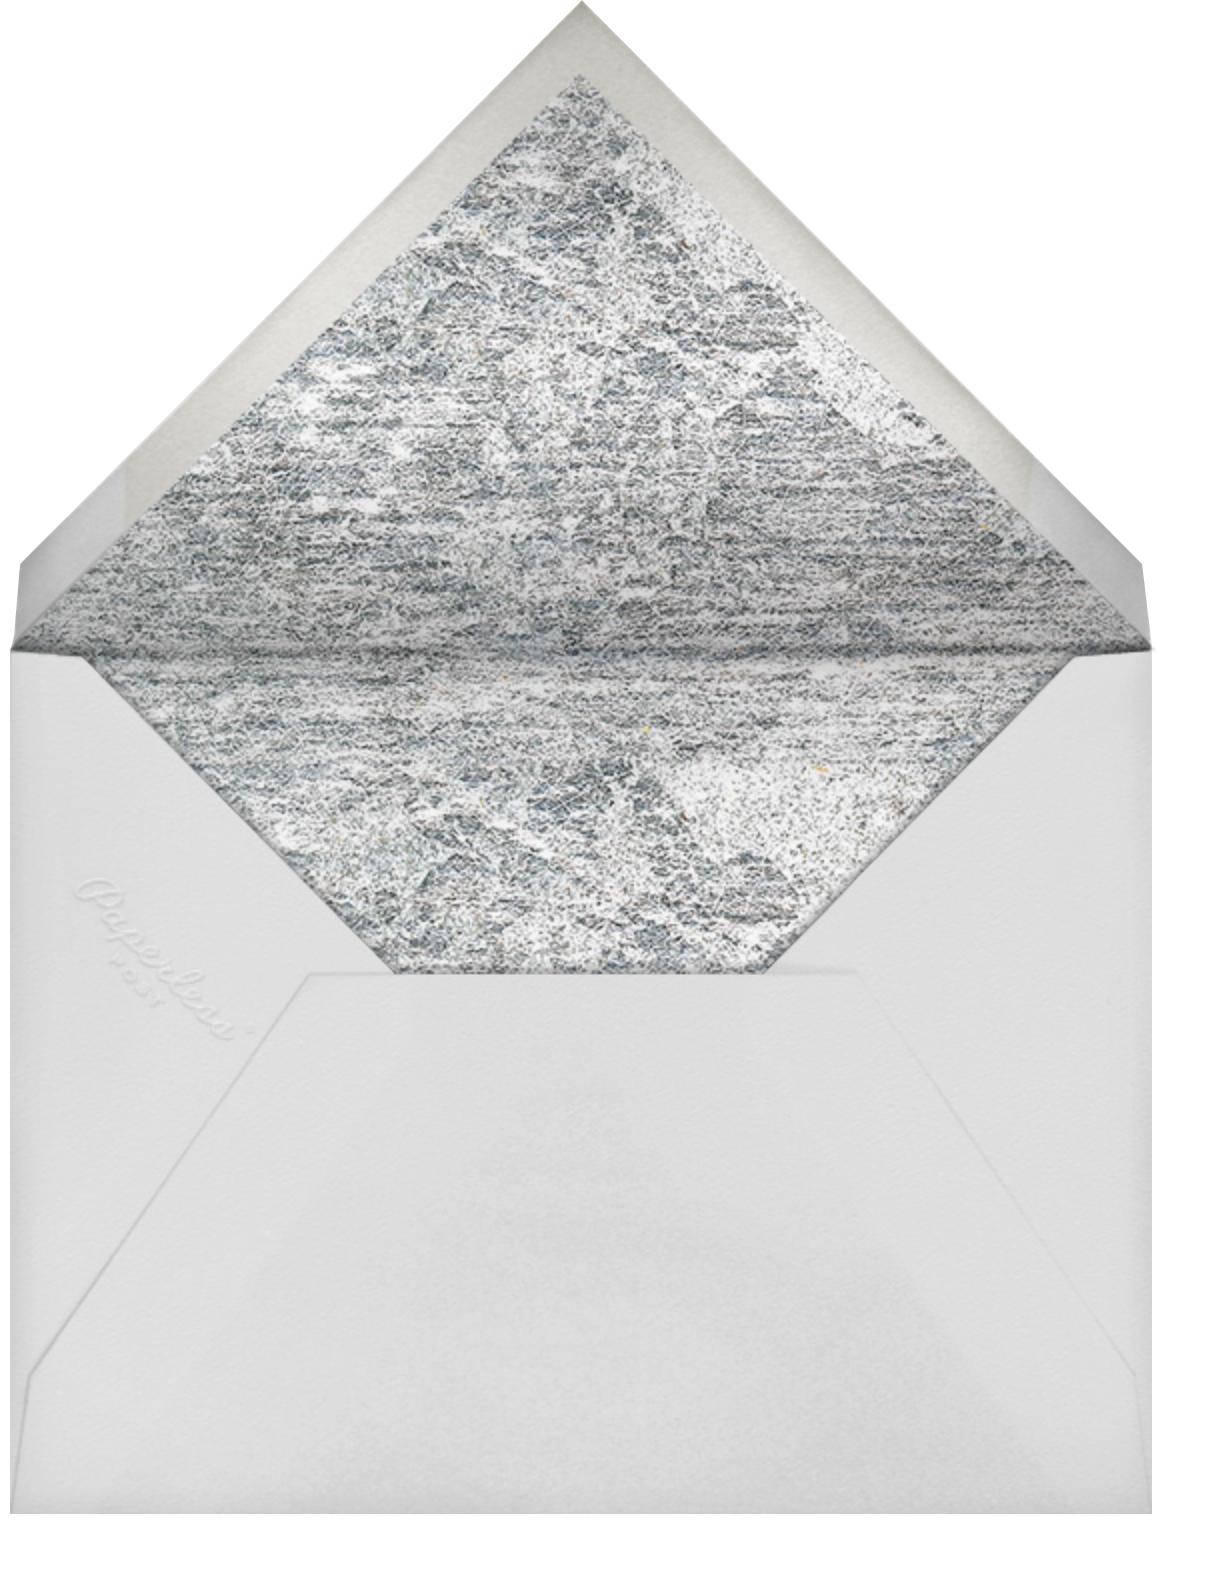 Jubilee II (Save the Date) - Black - Kelly Wearstler - Save the date - envelope back